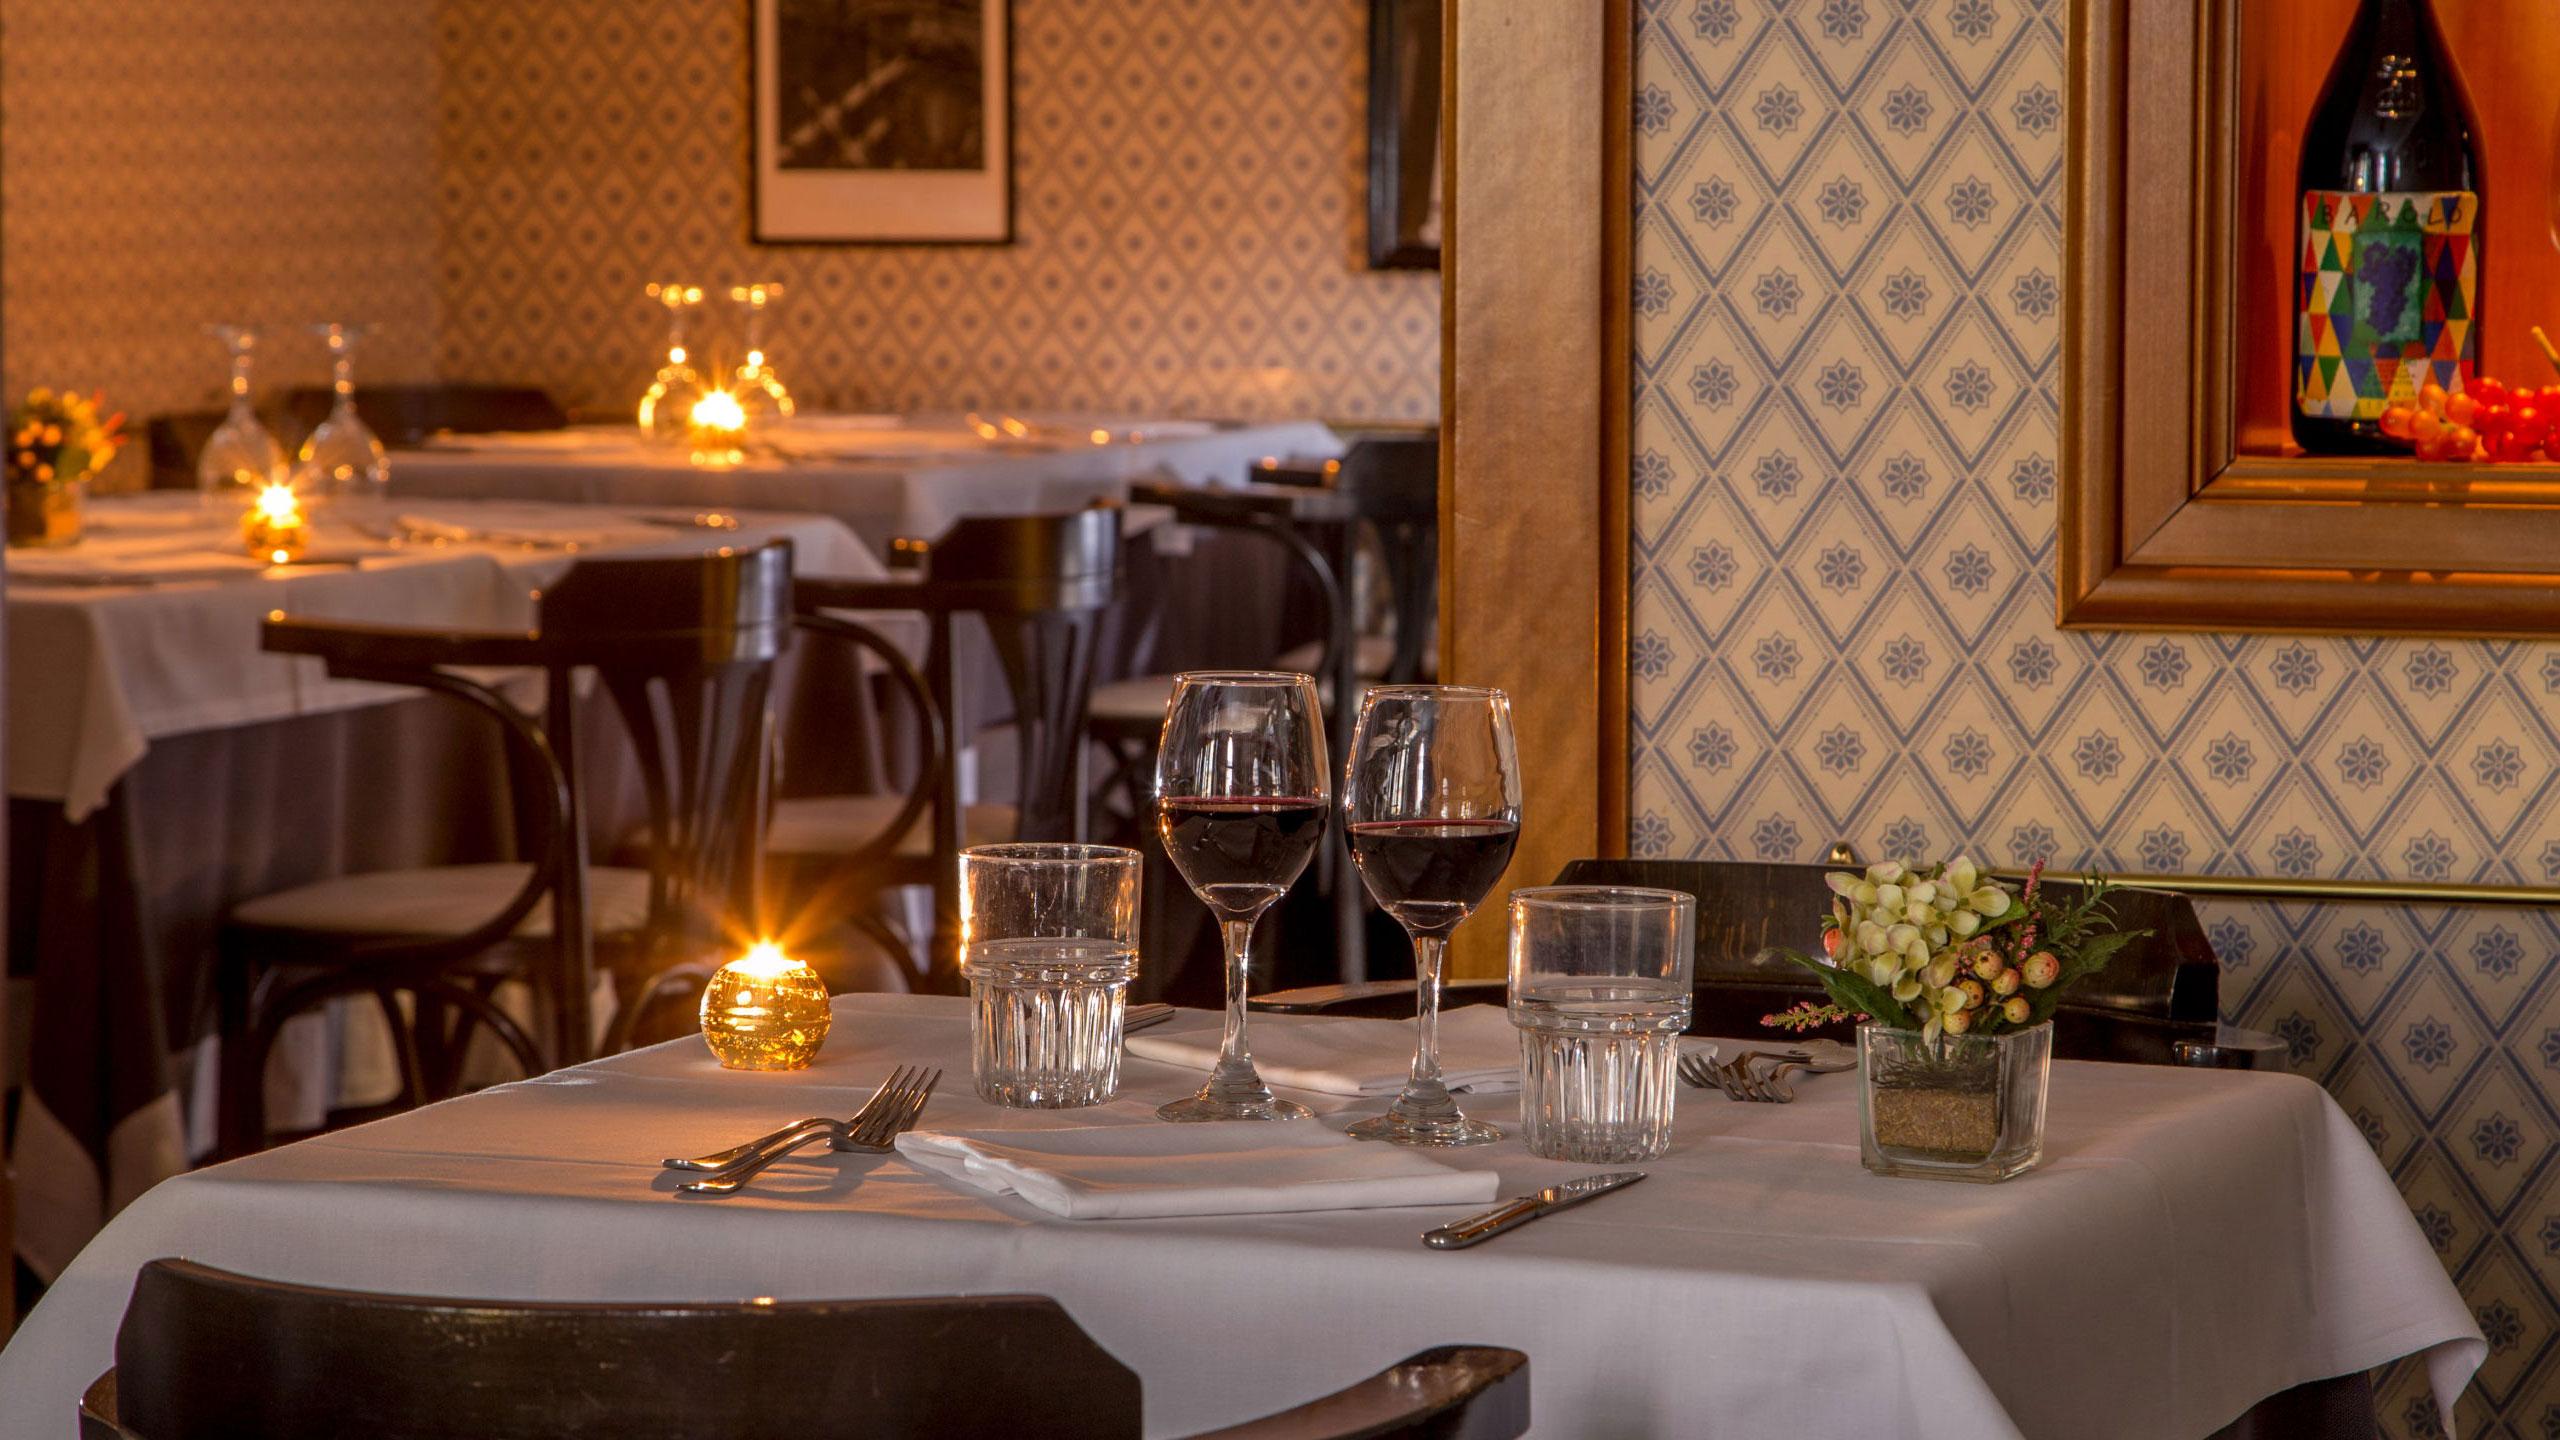 albergo-ottocento-rome-rossini-restaurant-04